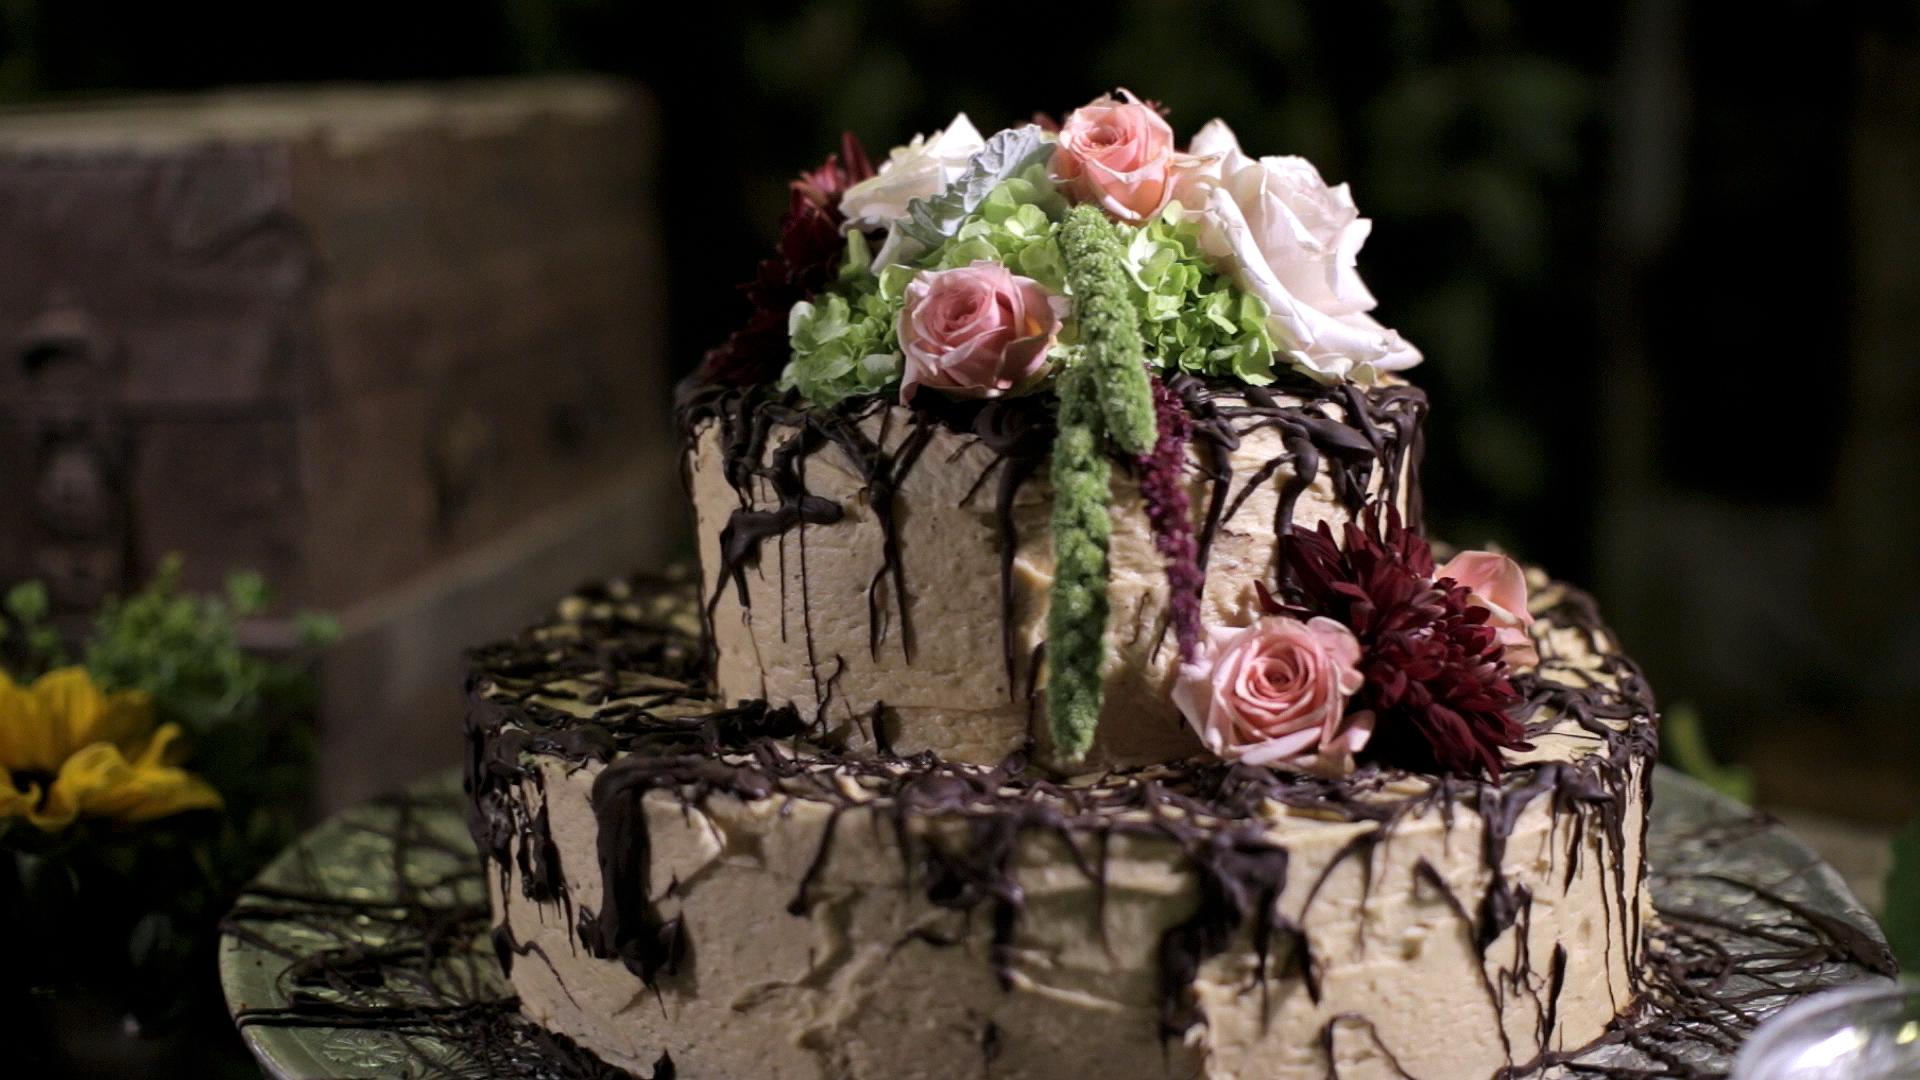 laurynandrew-cake.jpg